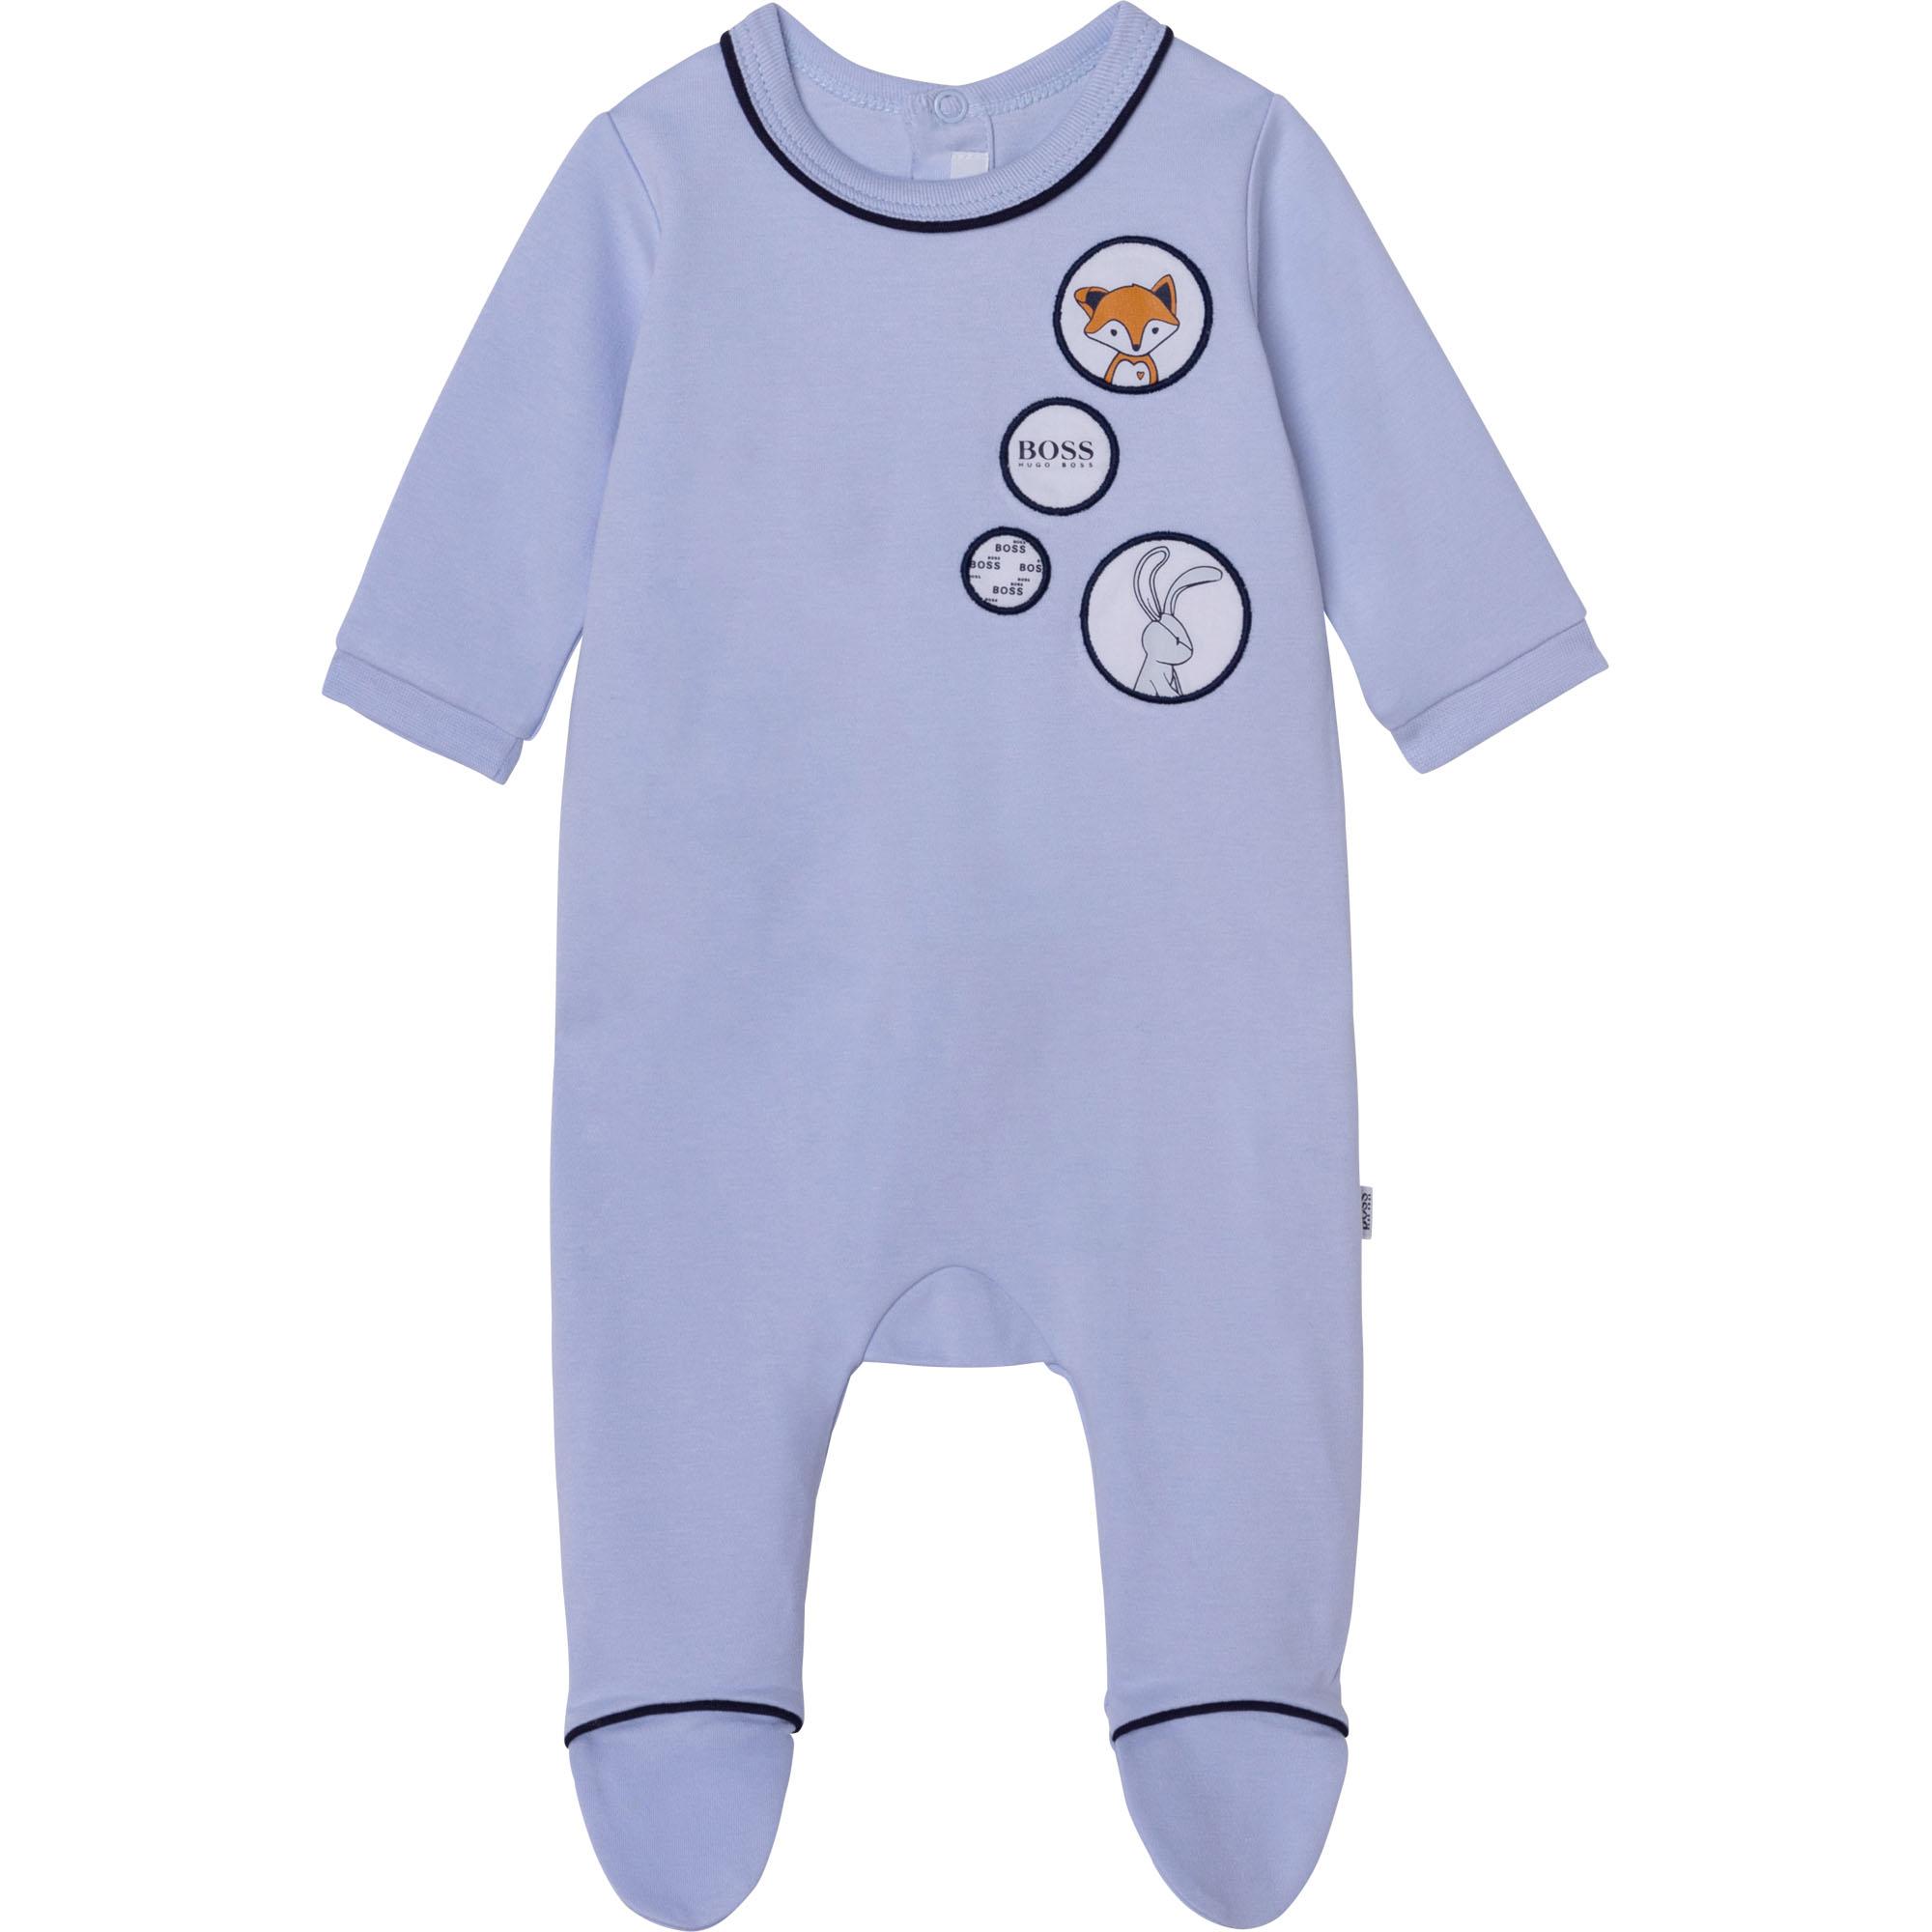 Decorative press stud pajamas BOSS for BOY